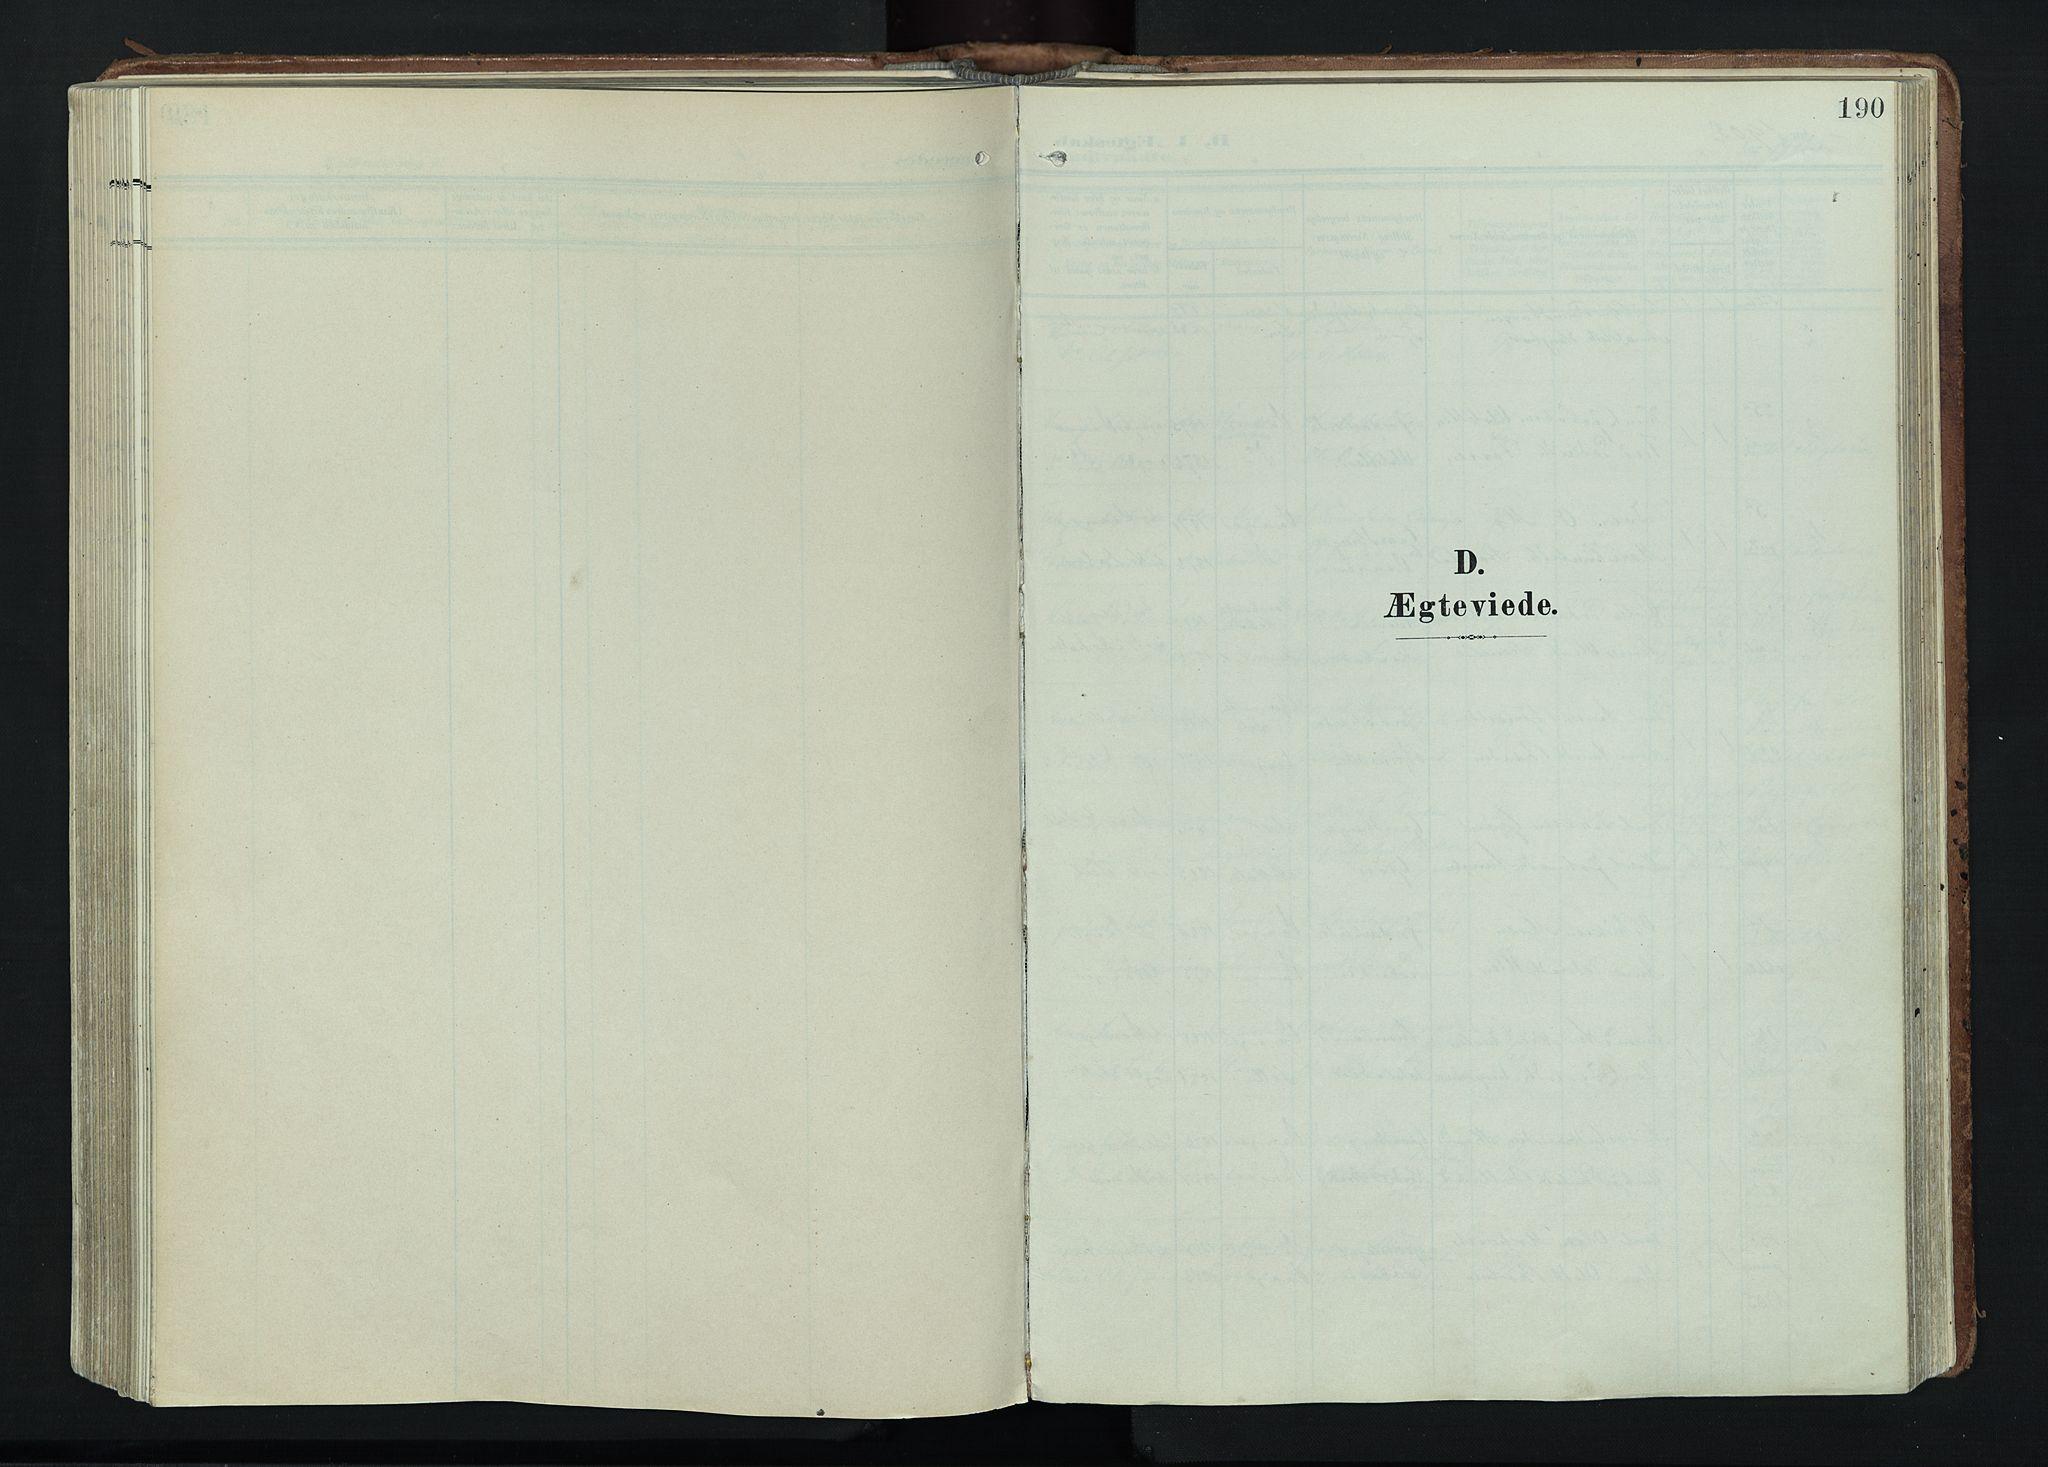 SAH, Vågå prestekontor, Ministerialbok nr. 11, 1905-1924, s. 190